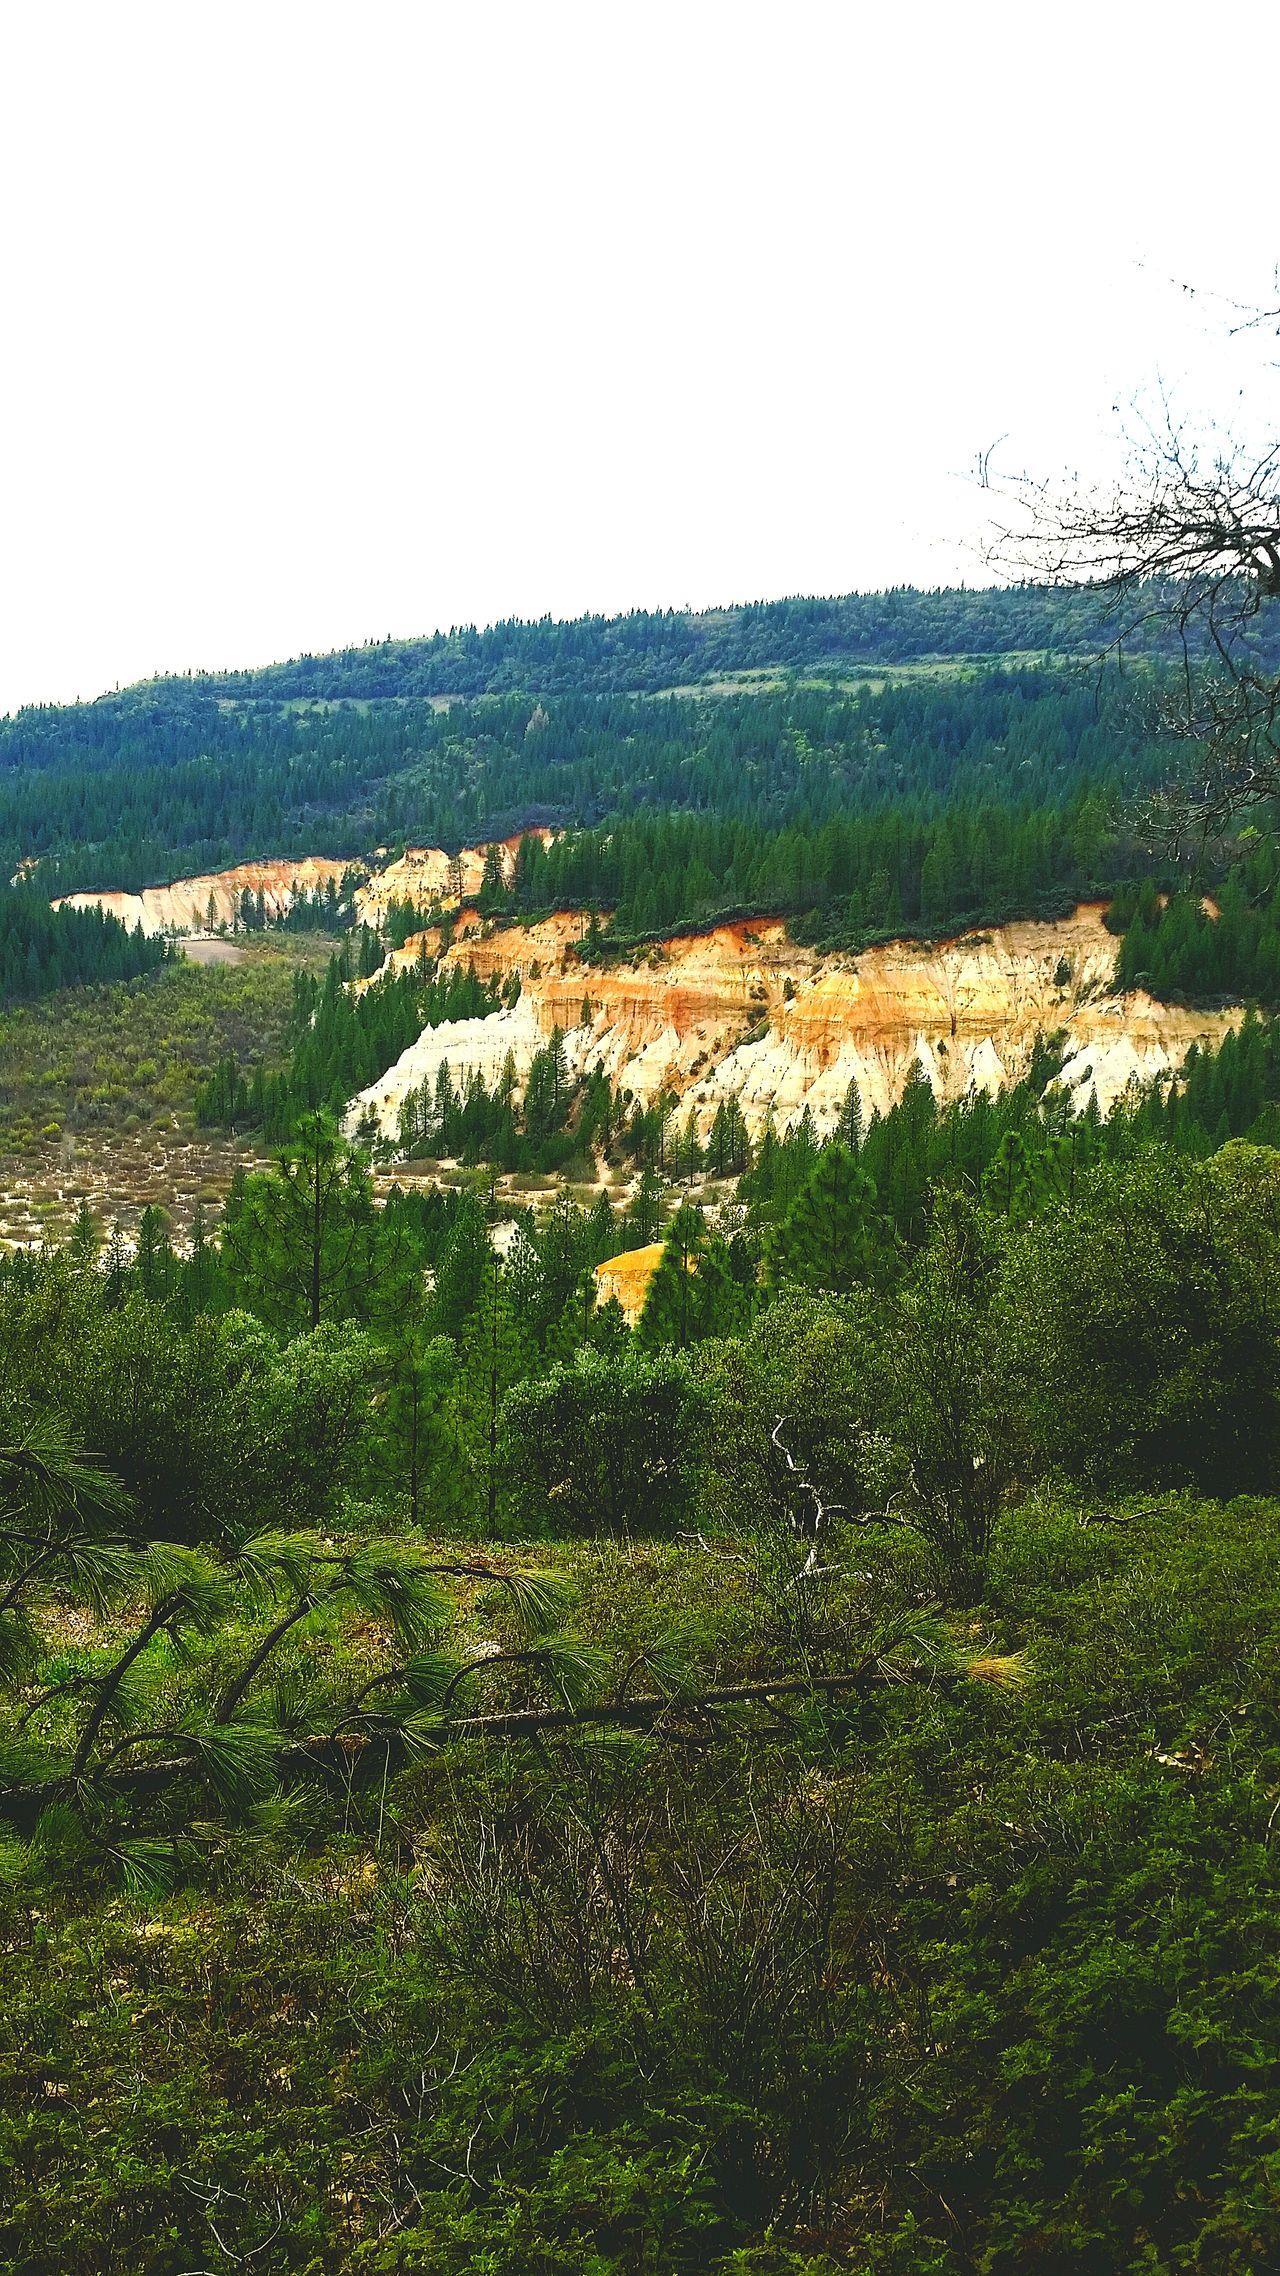 Malakoff Diggins State Park